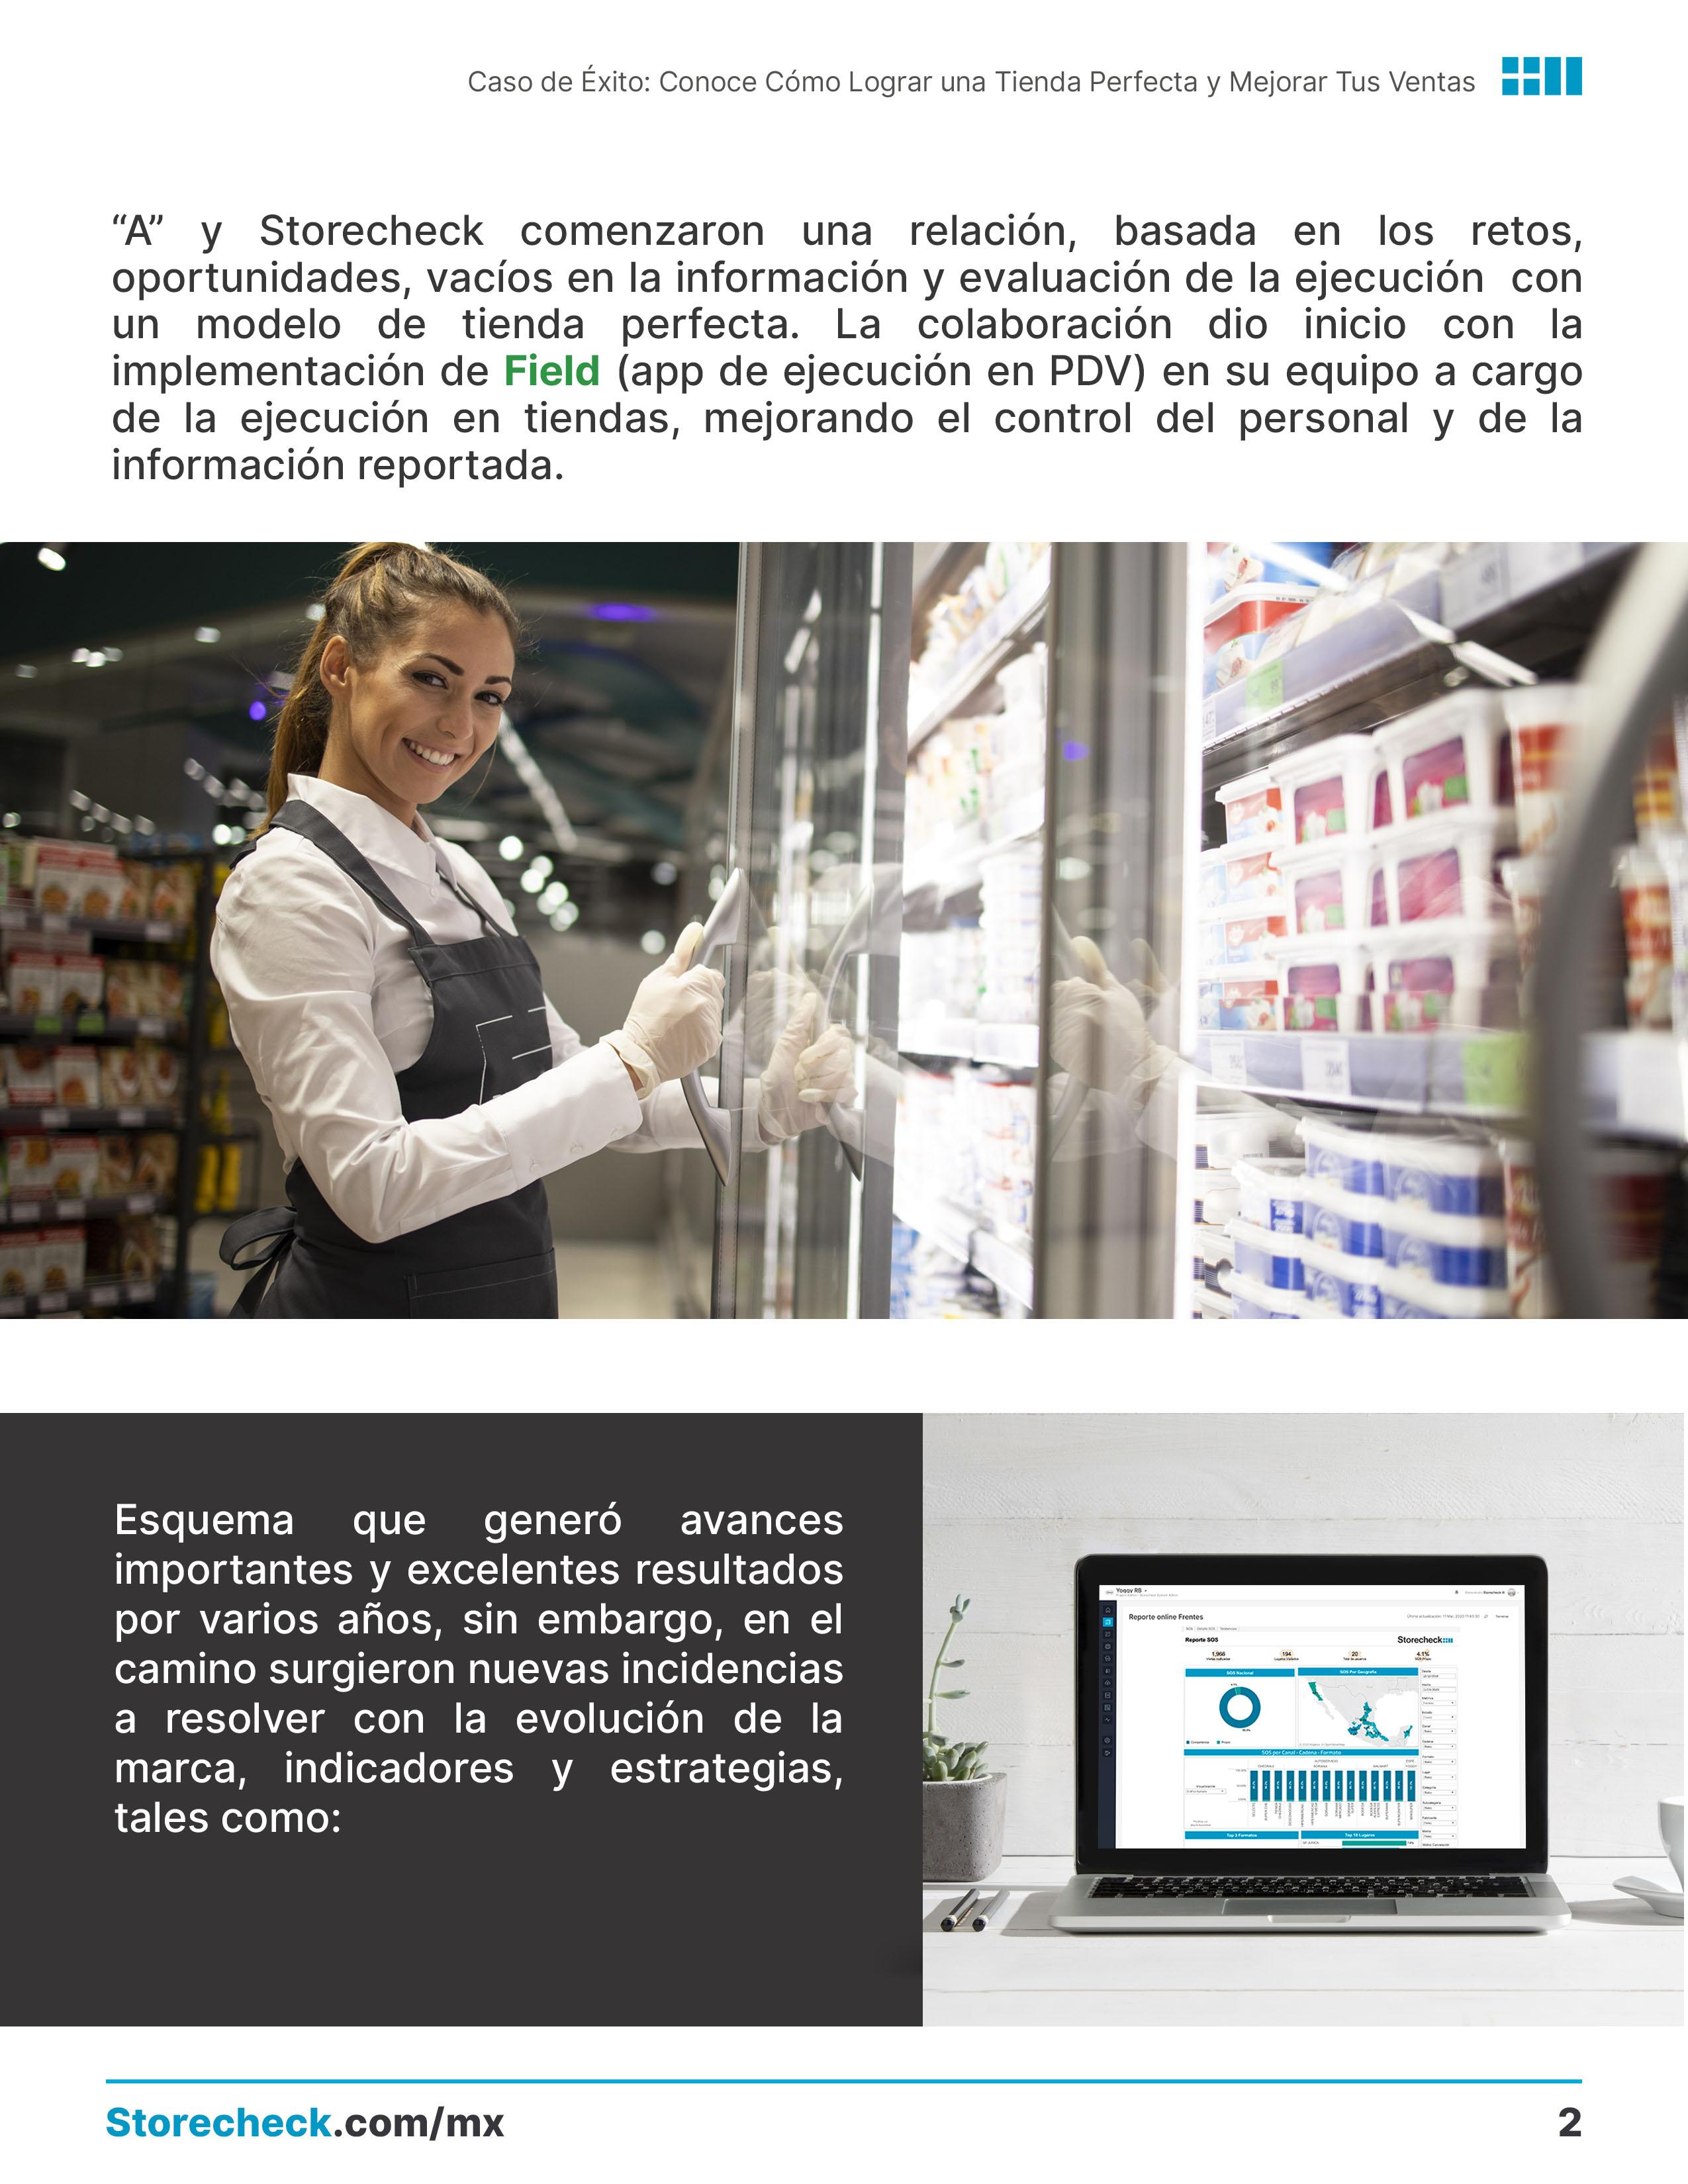 Ebook-Storecheck-tendencias-post-covid-19-pag-1